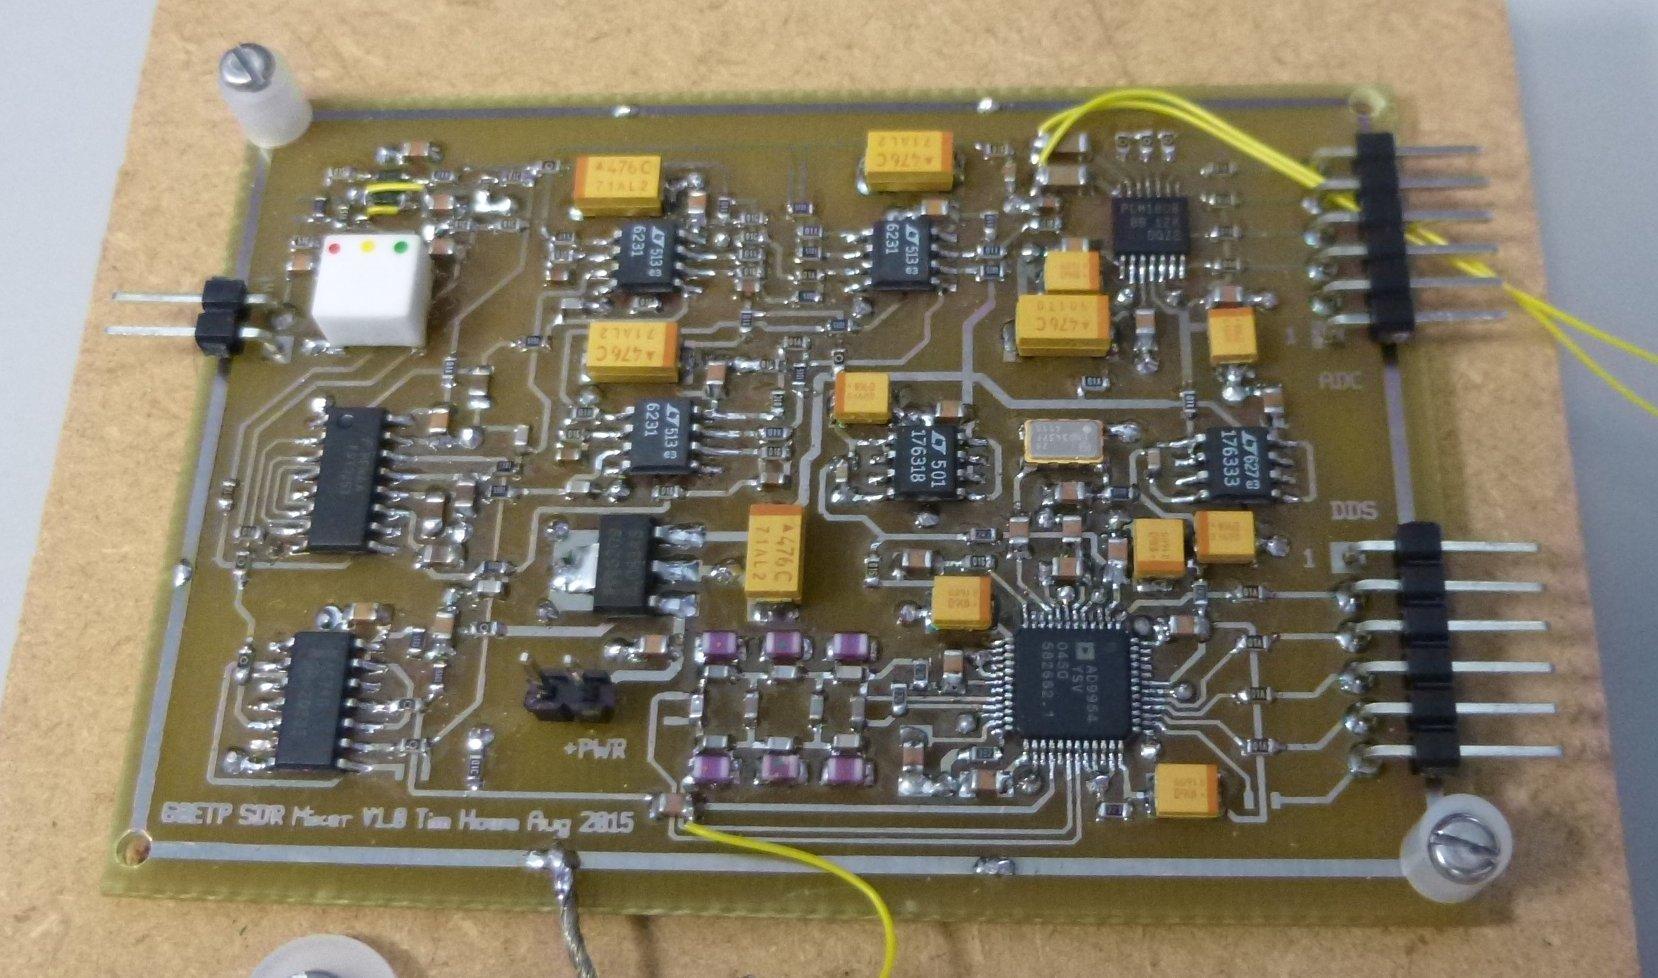 Tim Howe (G0ETP)'s Home Brew ARM-based SDR HF Rx